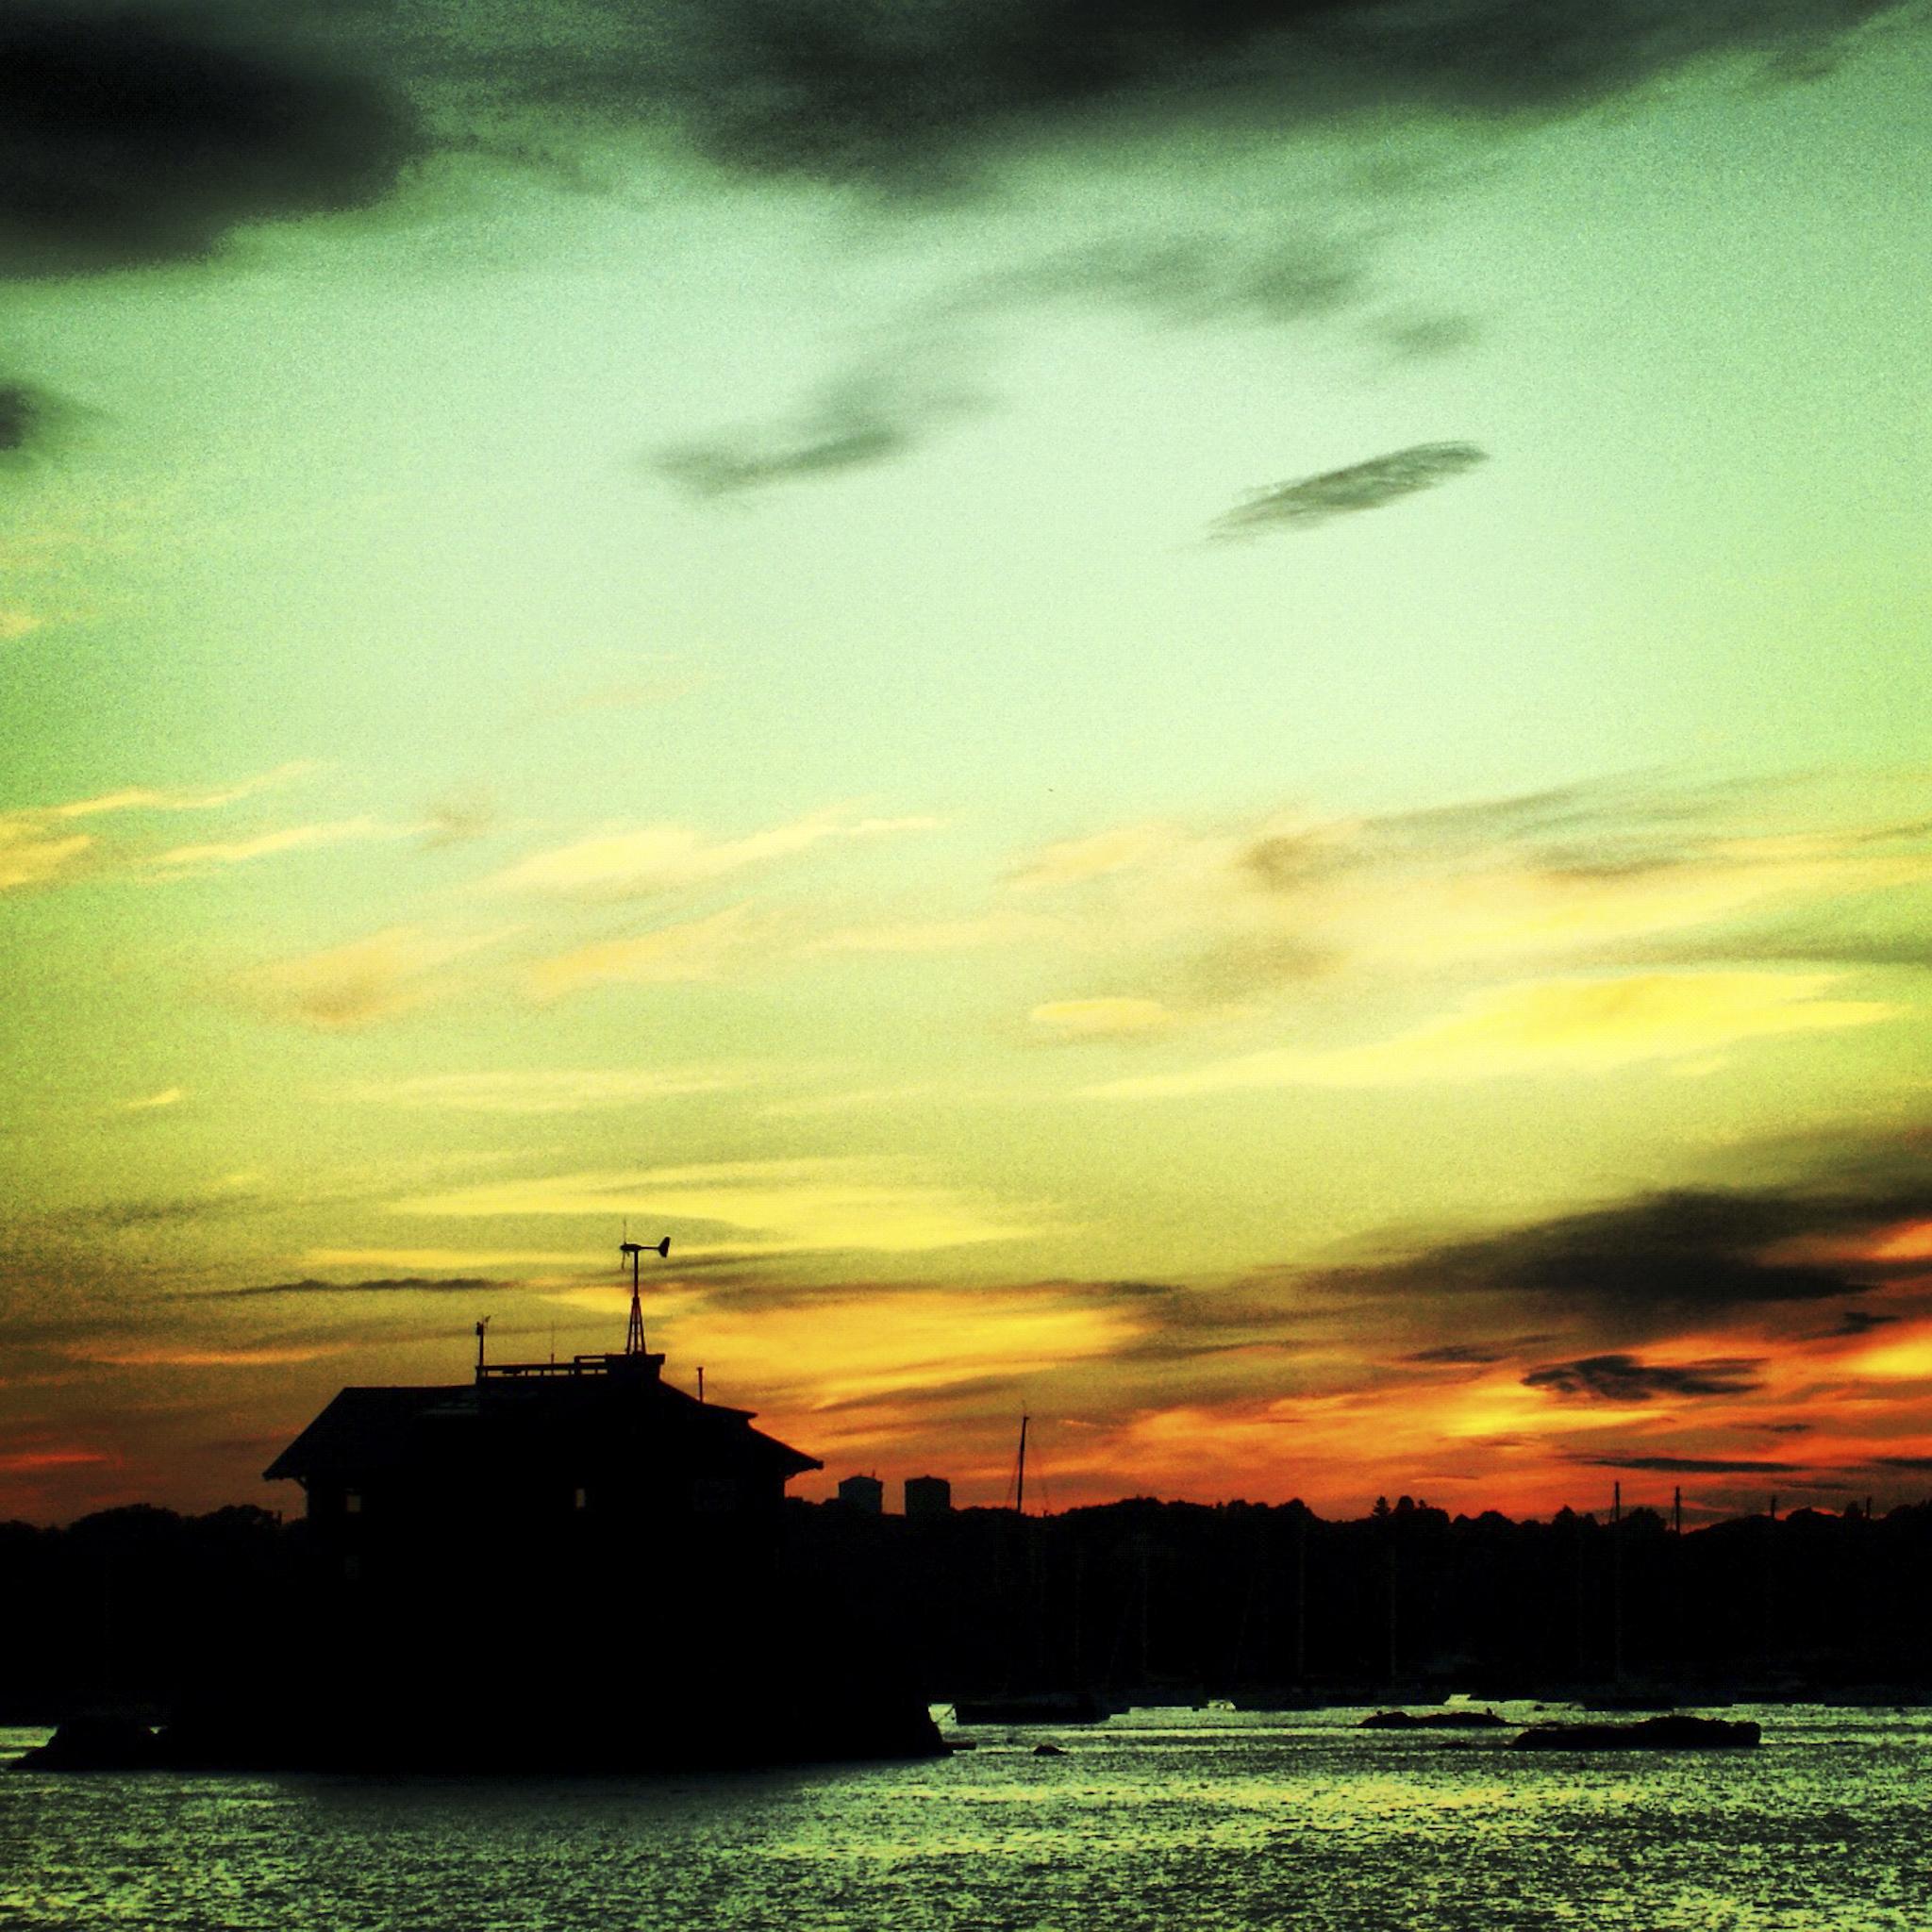 NE_SunsetSkyline_033.jpg